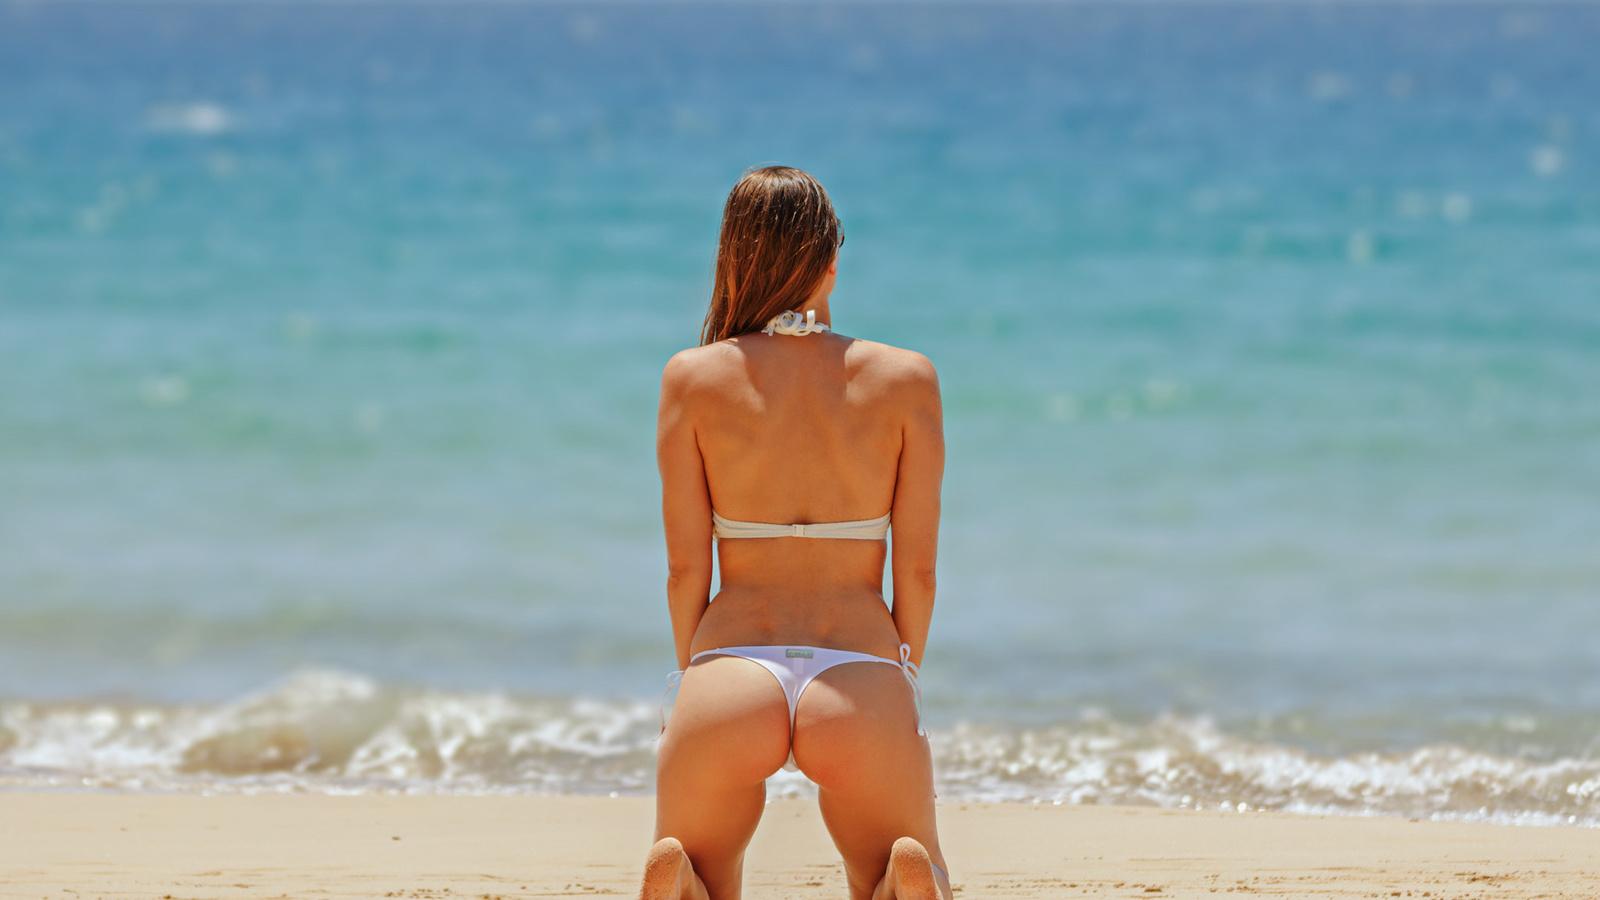 Girls on the beach having sex — 5